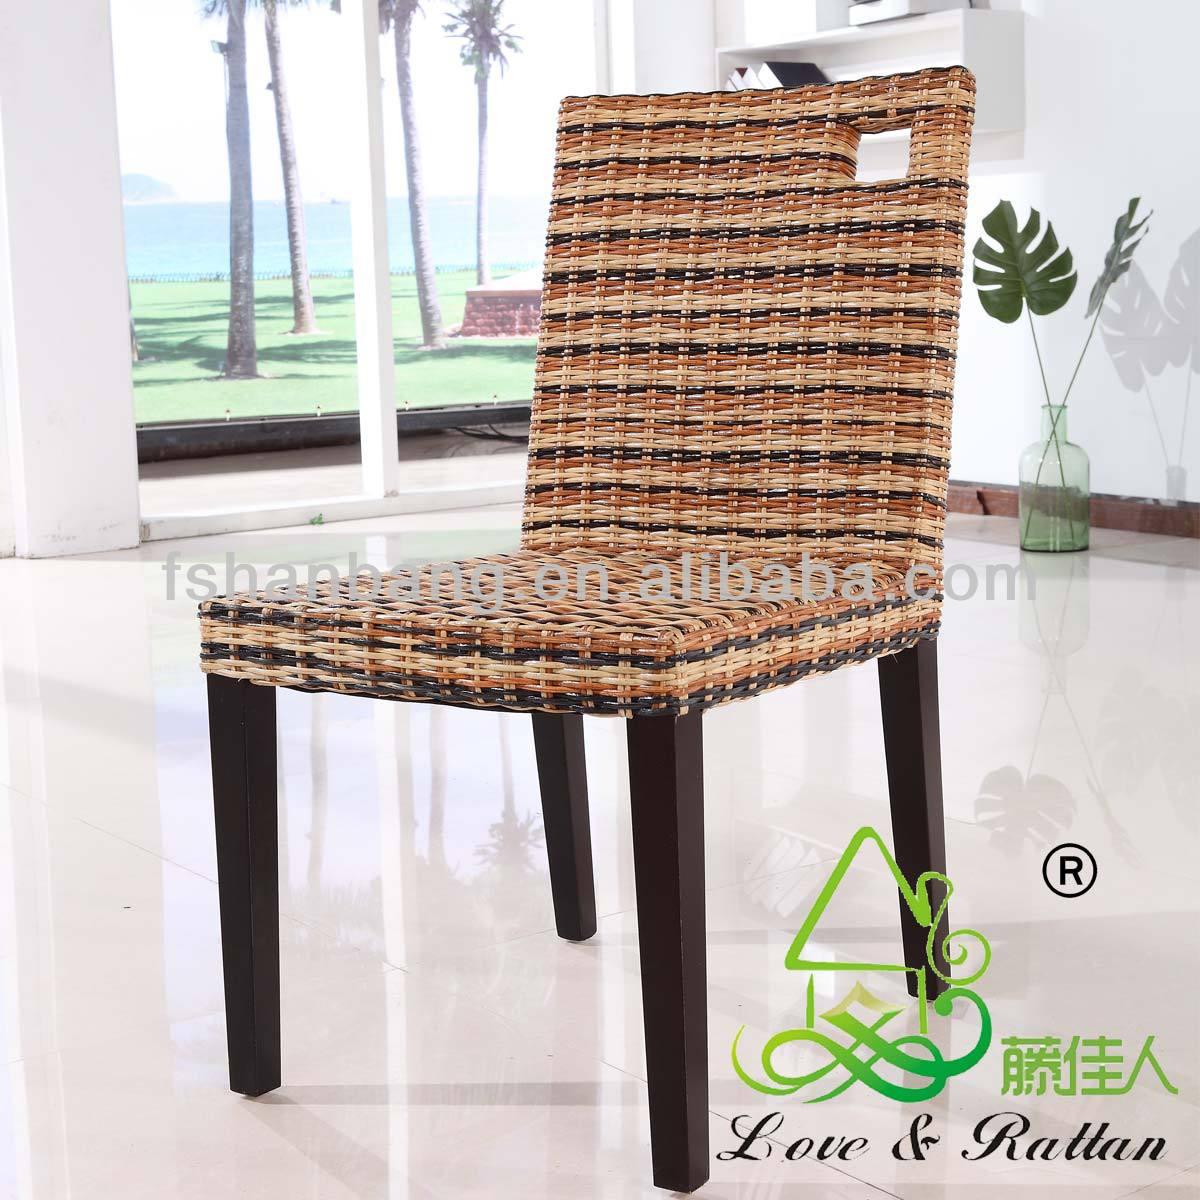 Rattan Soft Set Rattan Meditation Chair